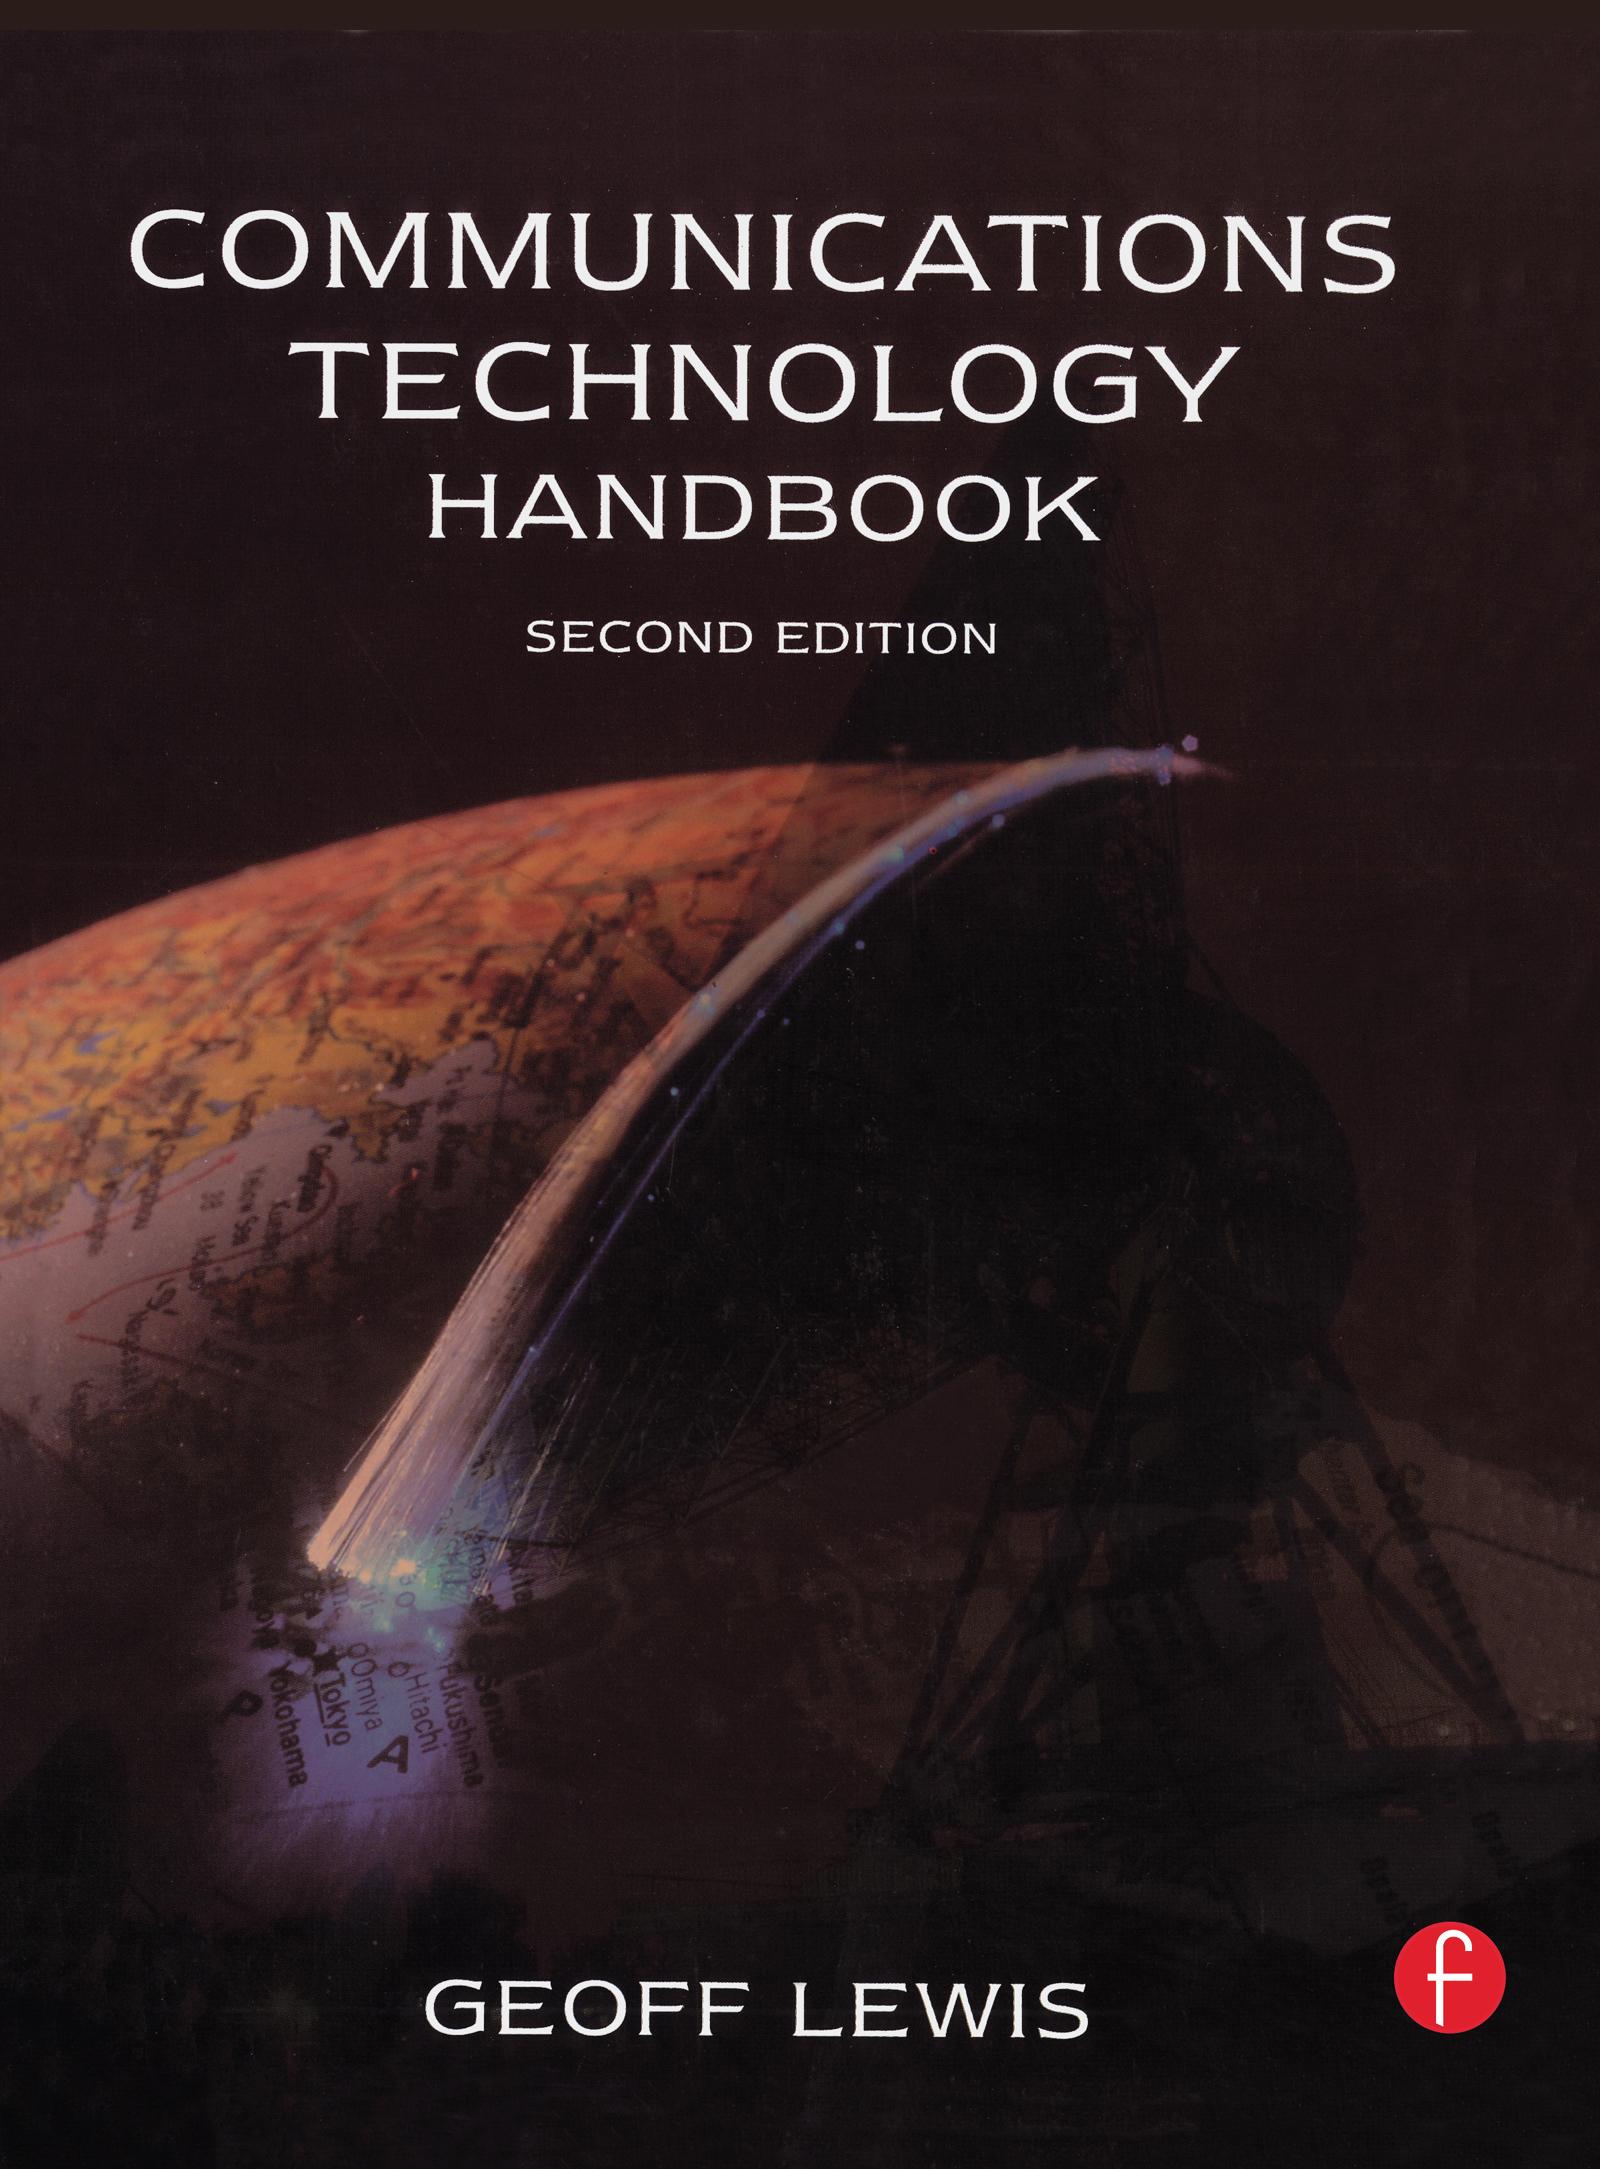 Communications Technology Handbook